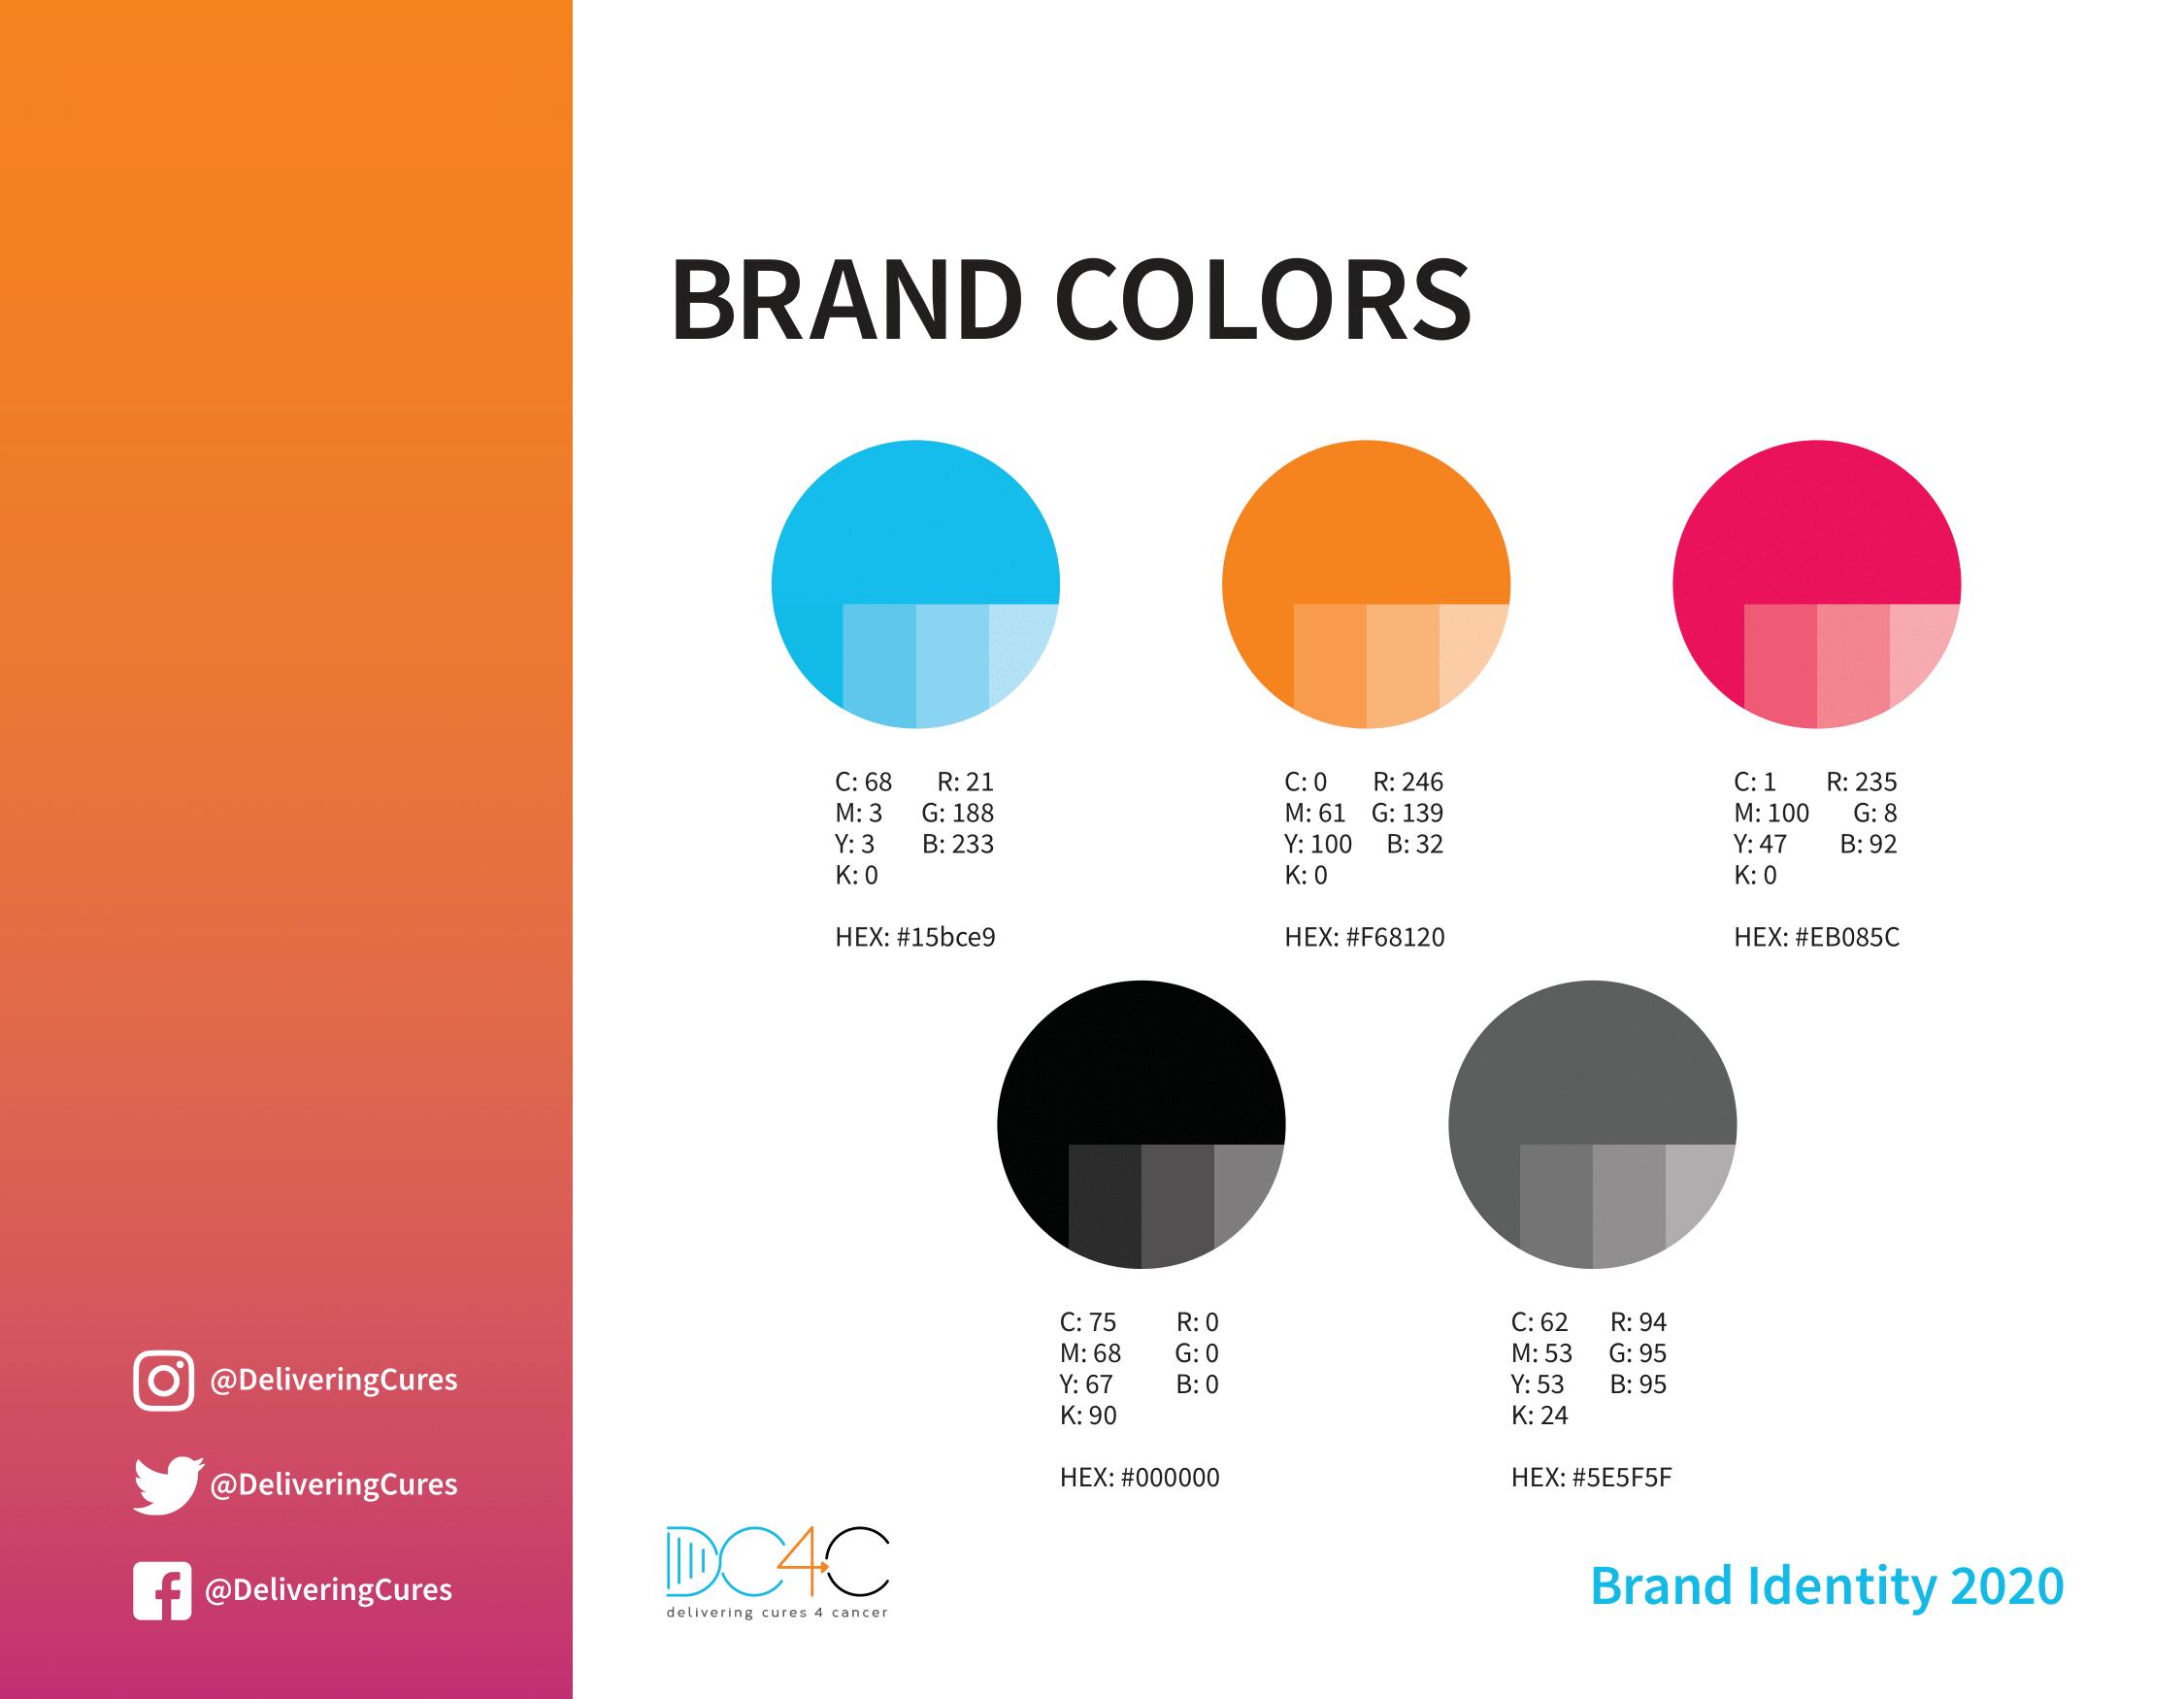 DC4C-Brand_Identity-2020-5